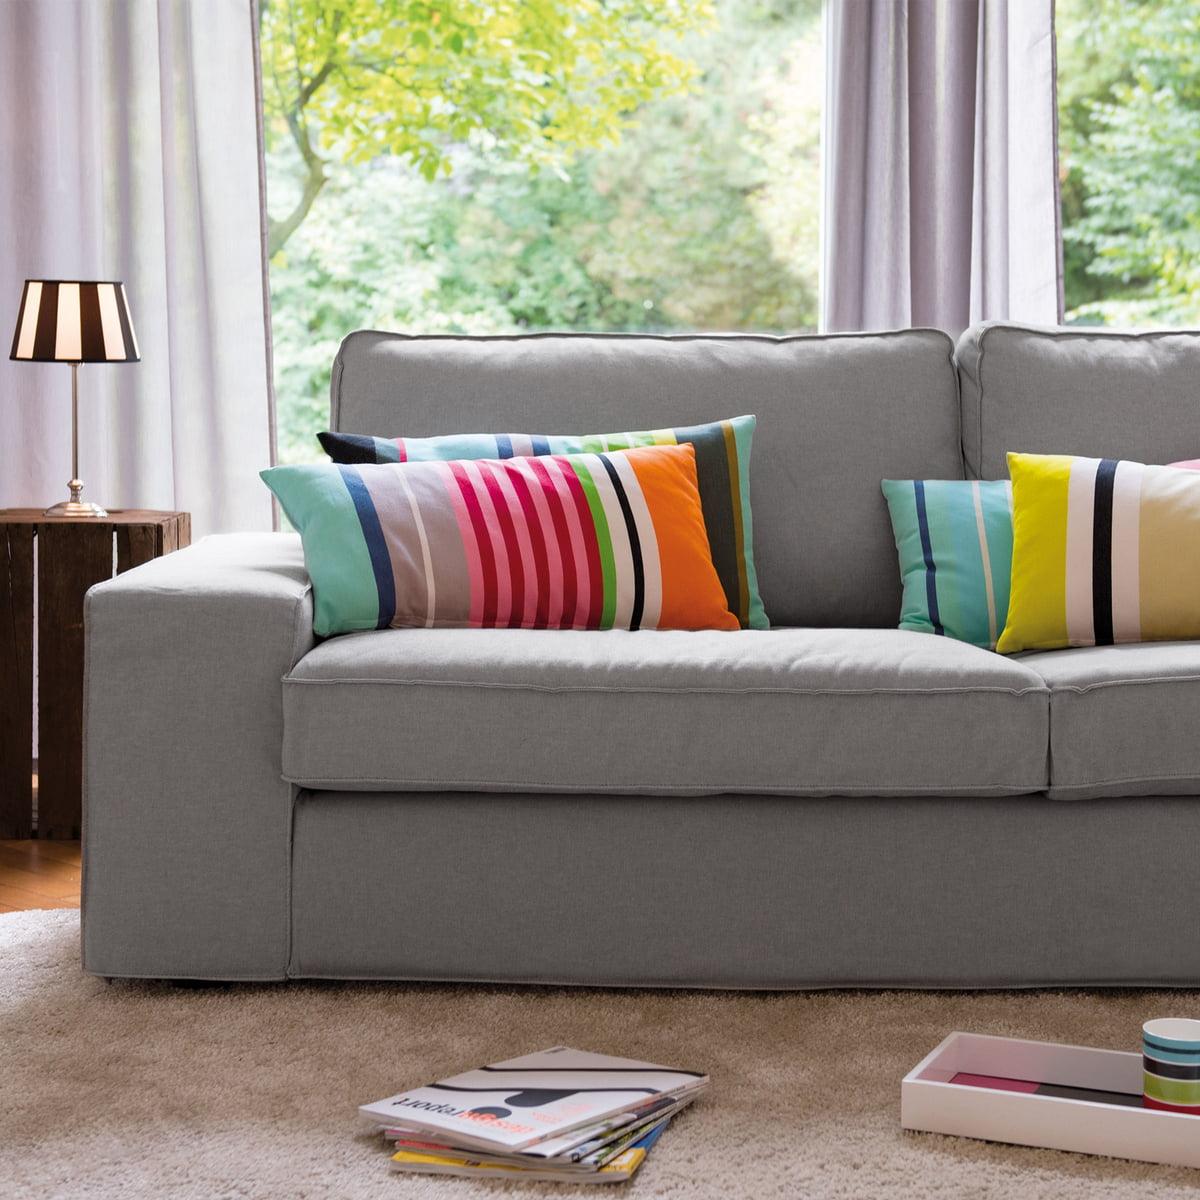 kissen 60 x 30 von remember im shop. Black Bedroom Furniture Sets. Home Design Ideas